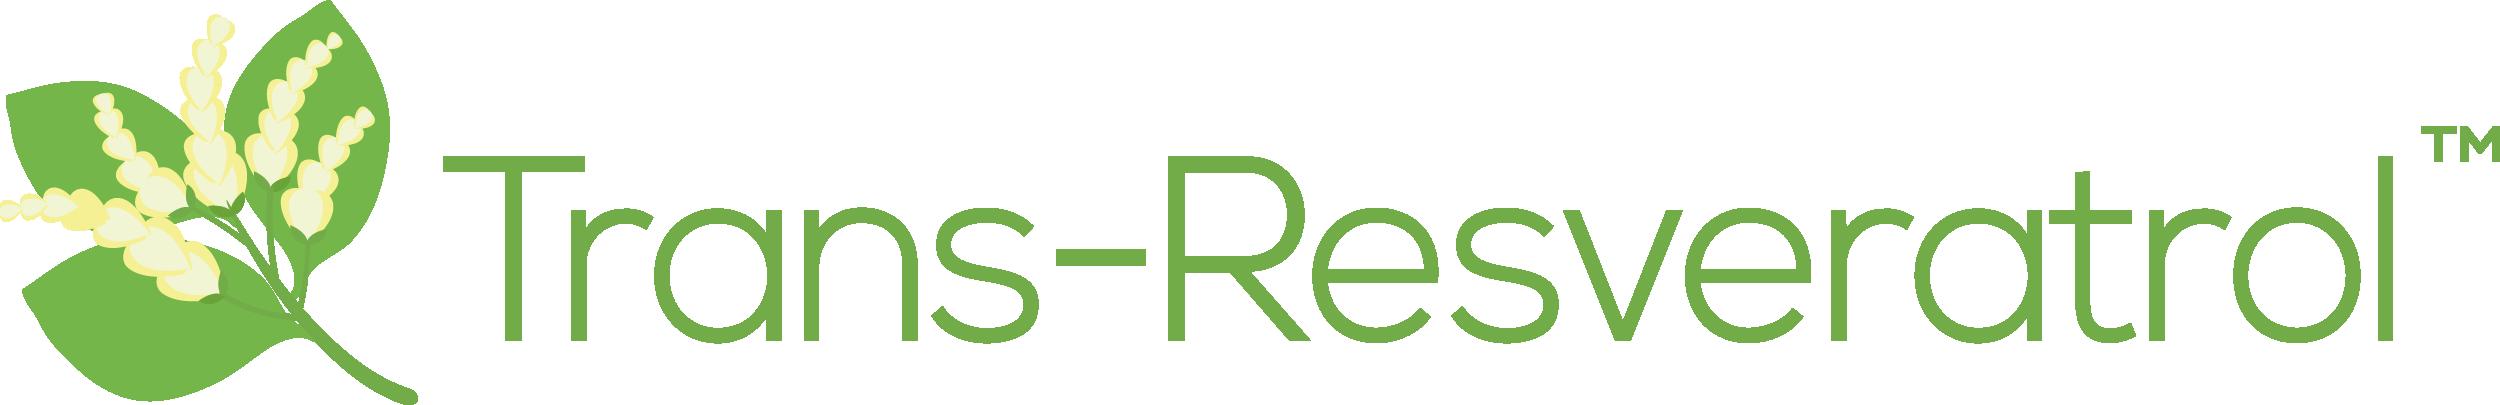 Trans-resveratrol Logo.png